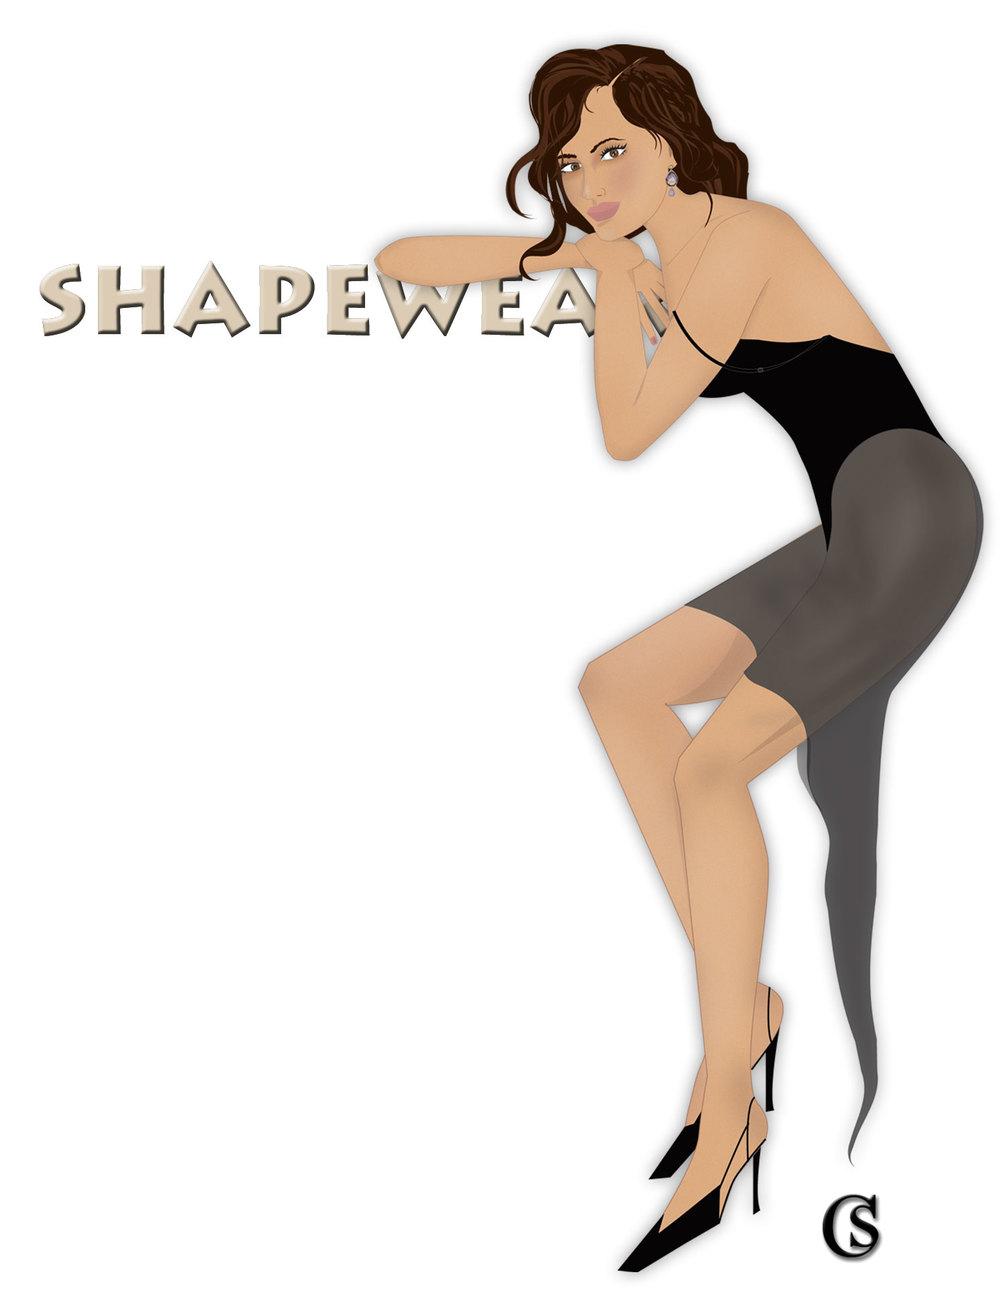 Shapewear CHIARIstyle